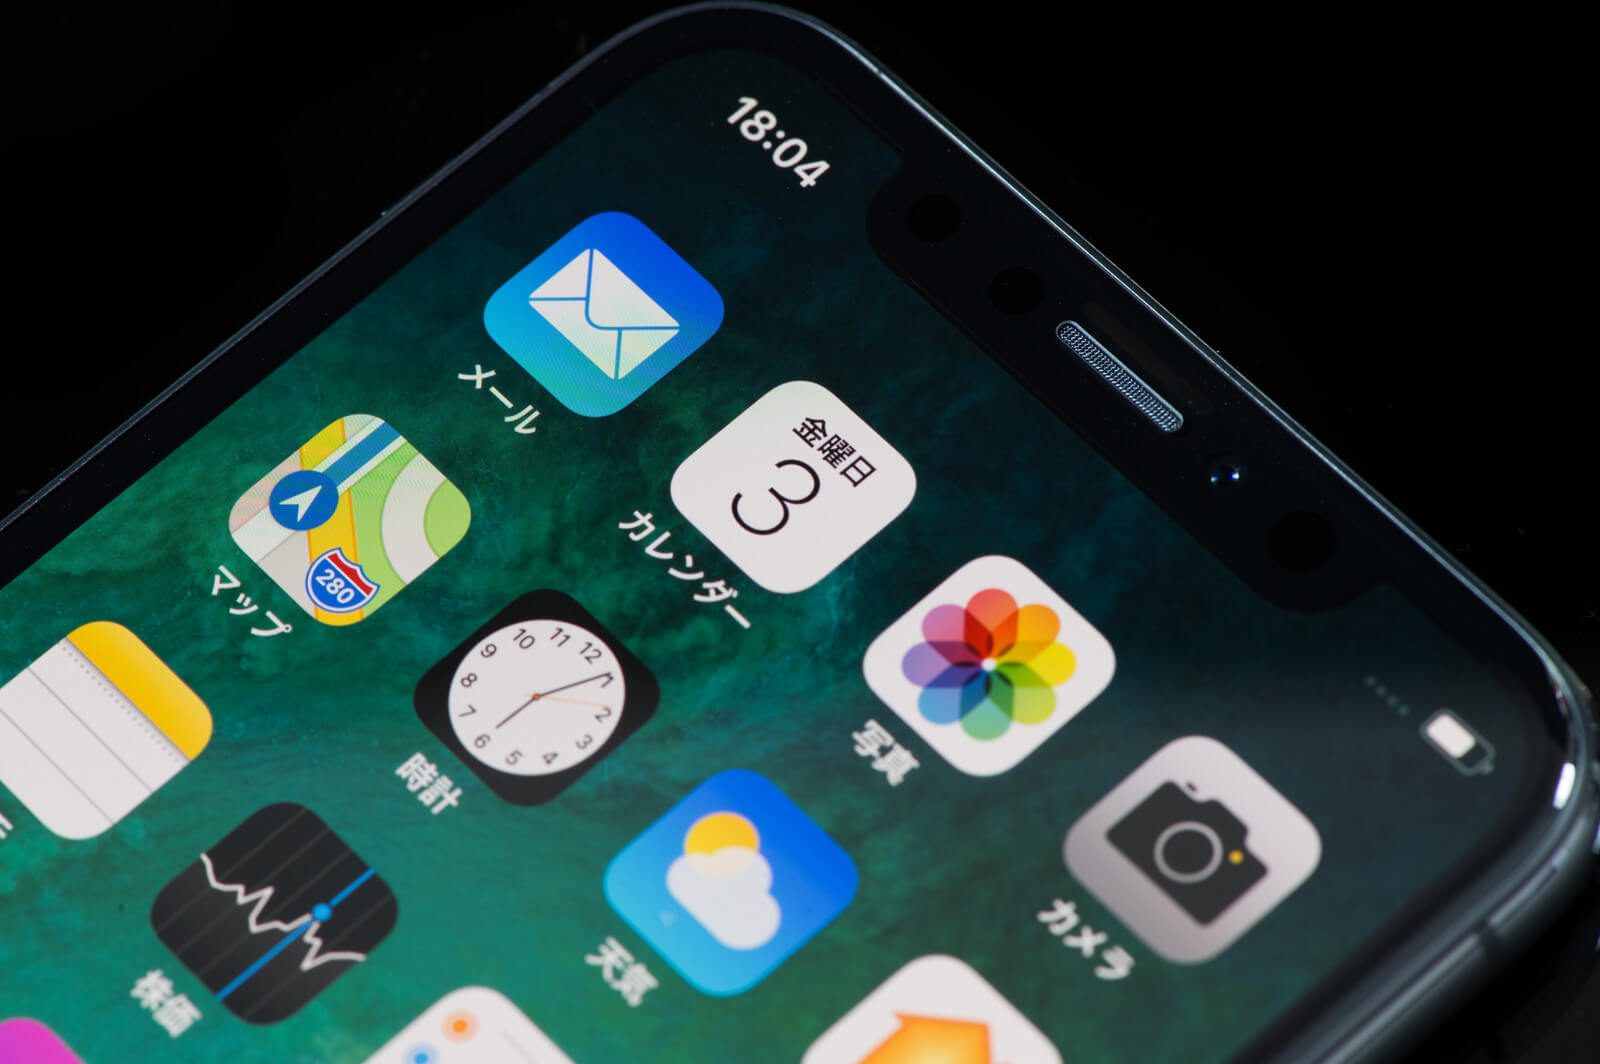 iphoneアプリのfeedlyの使い方